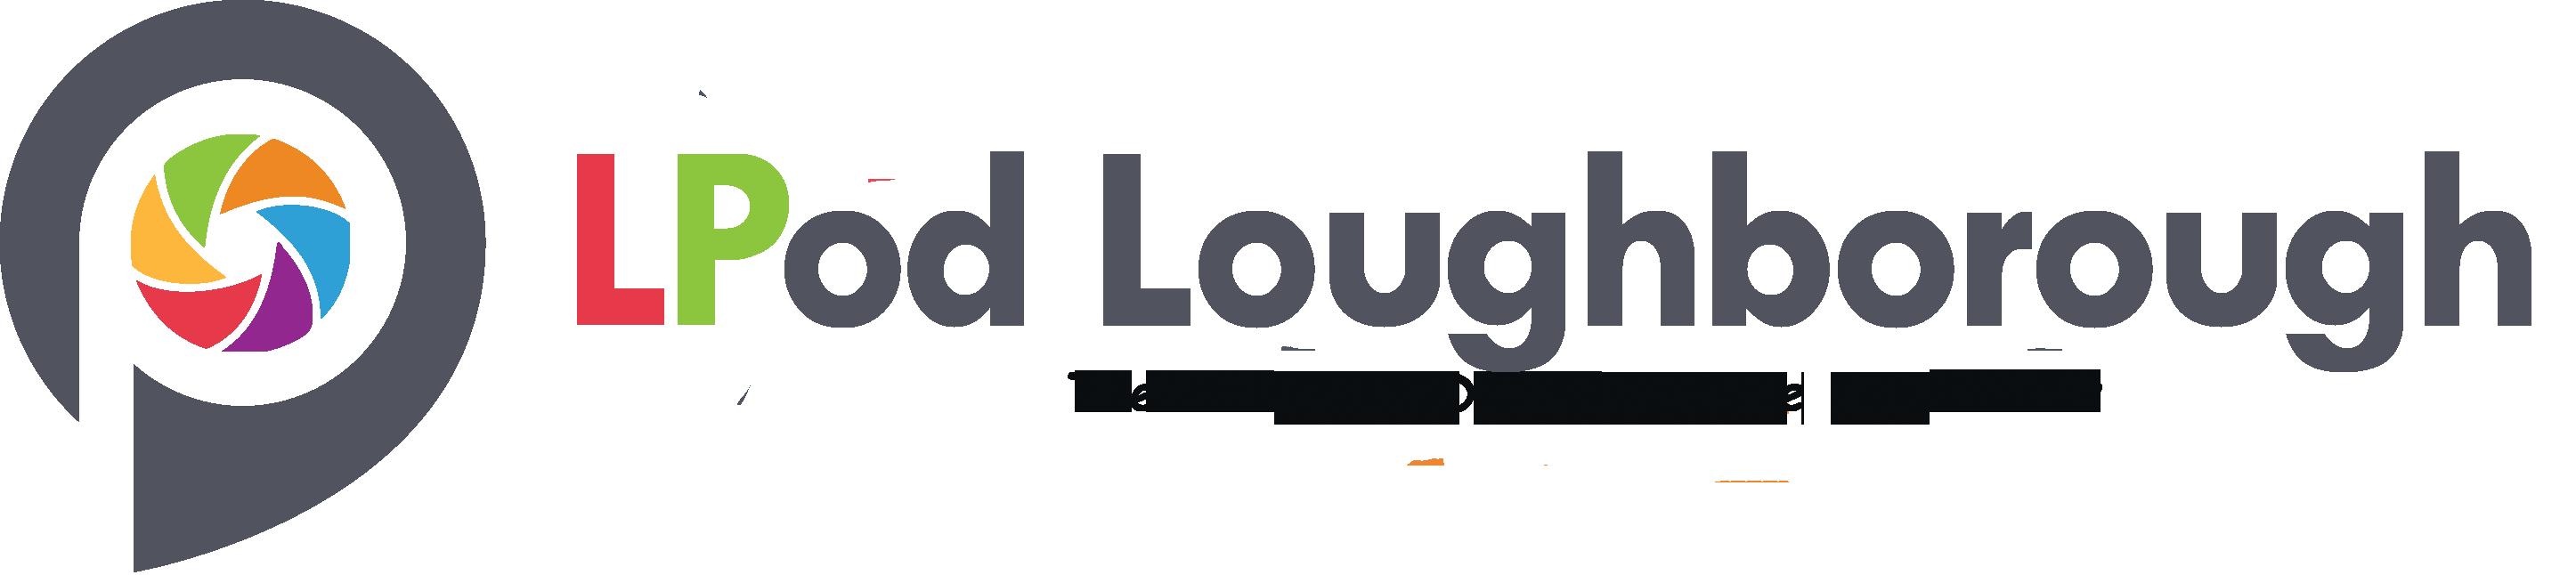 intensive driving courses loughborough, intensive driving lessons loughborough, intensive driving school loughborough